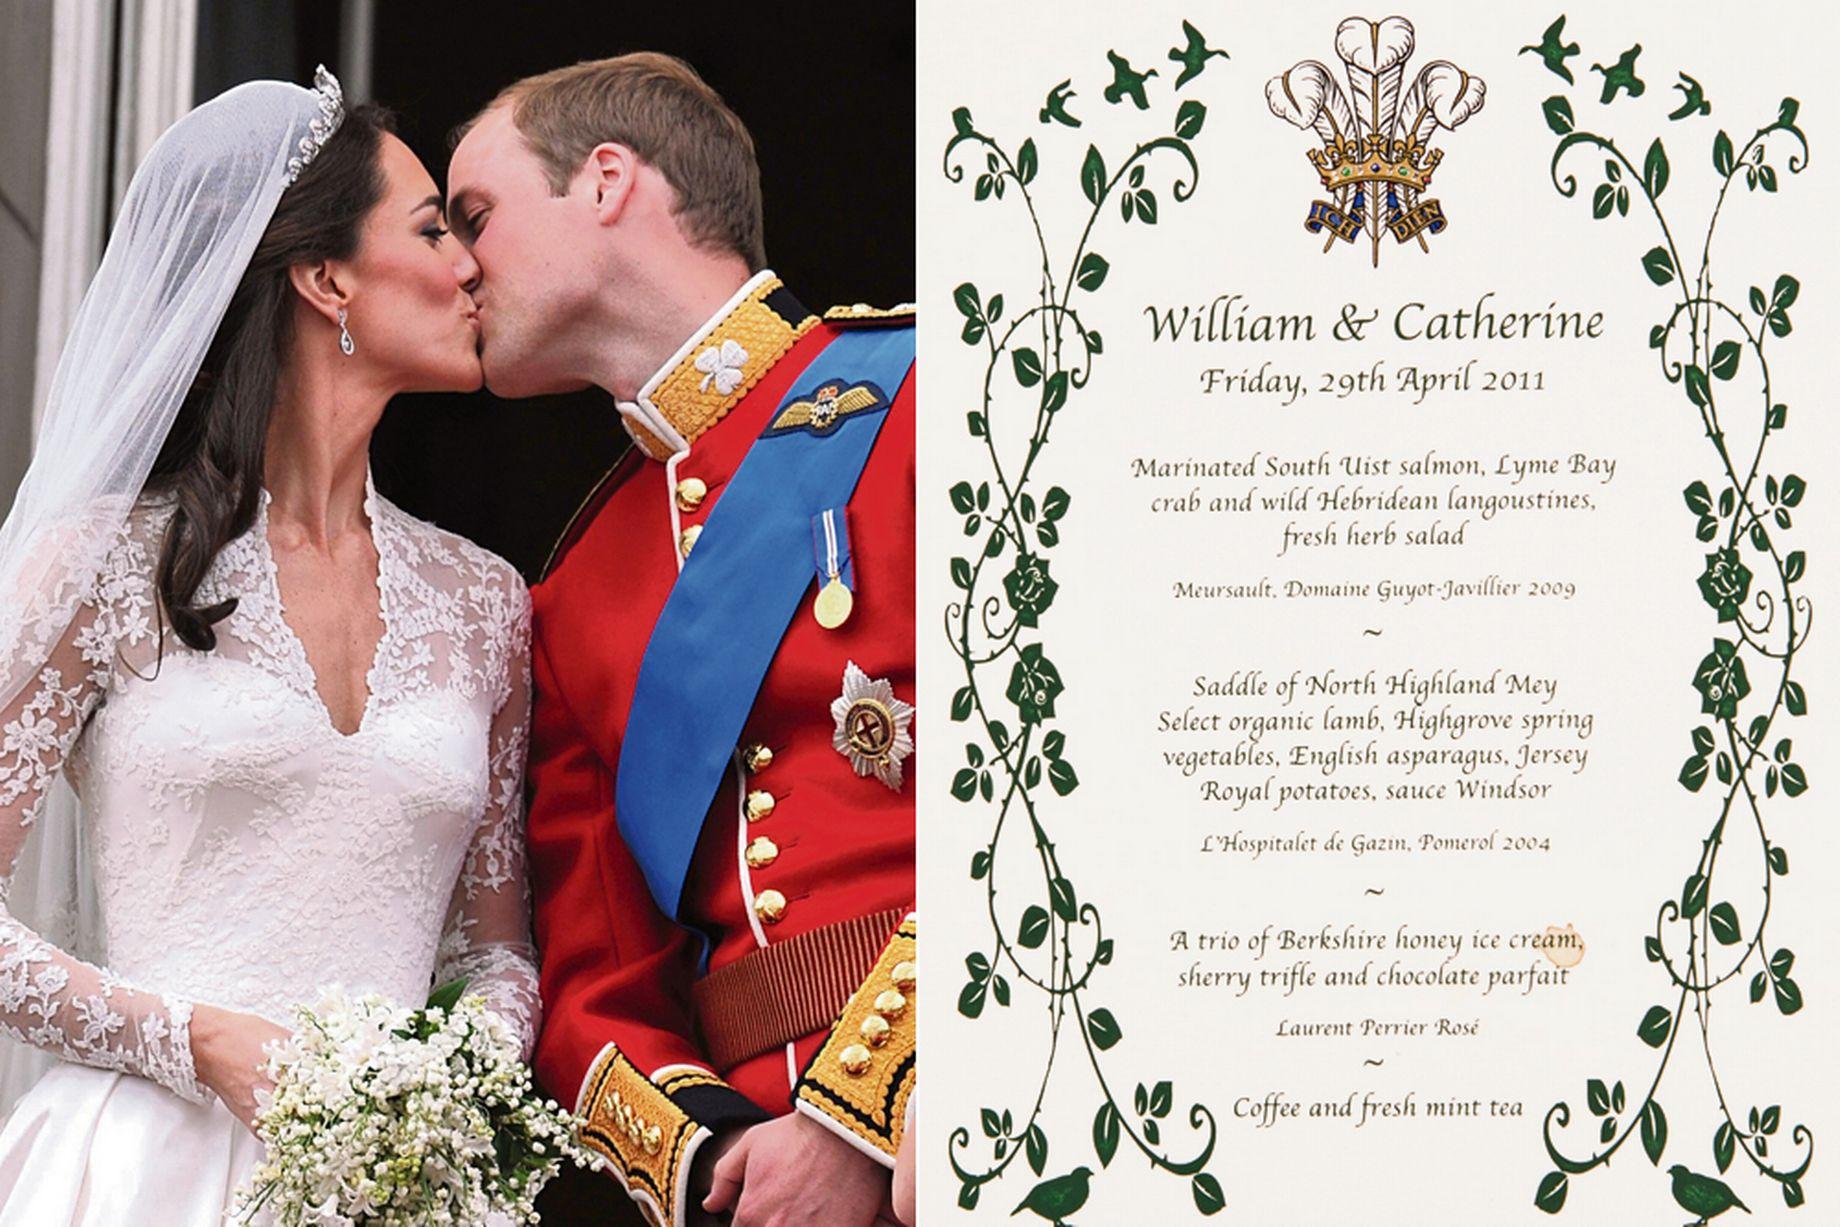 Revealed The Royal Wedding Breakfast